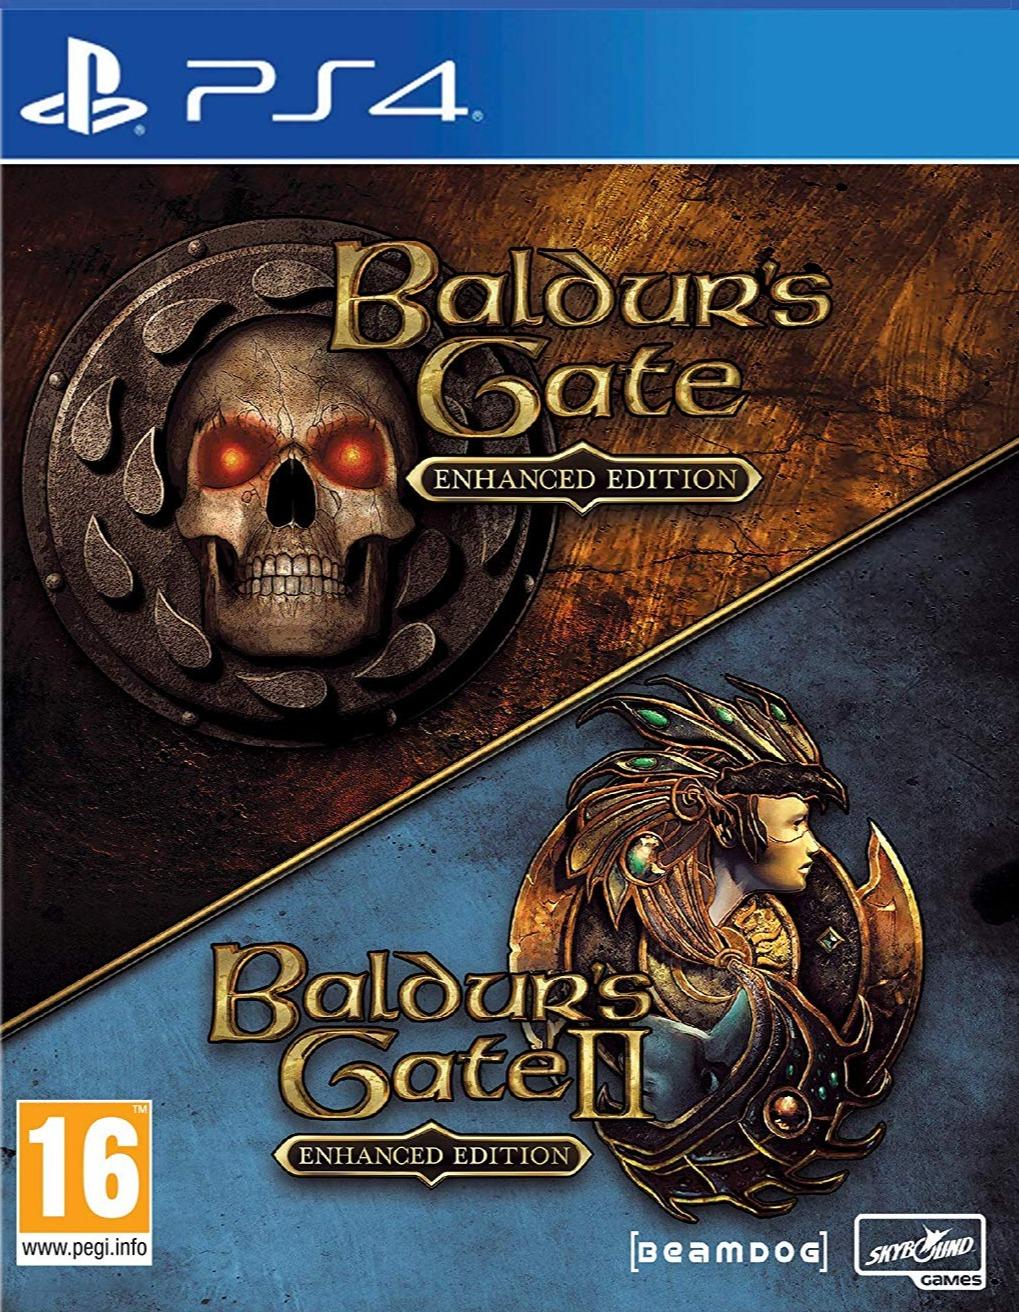 Baldurs Gate I & II: Enhanced Edition (PS4)